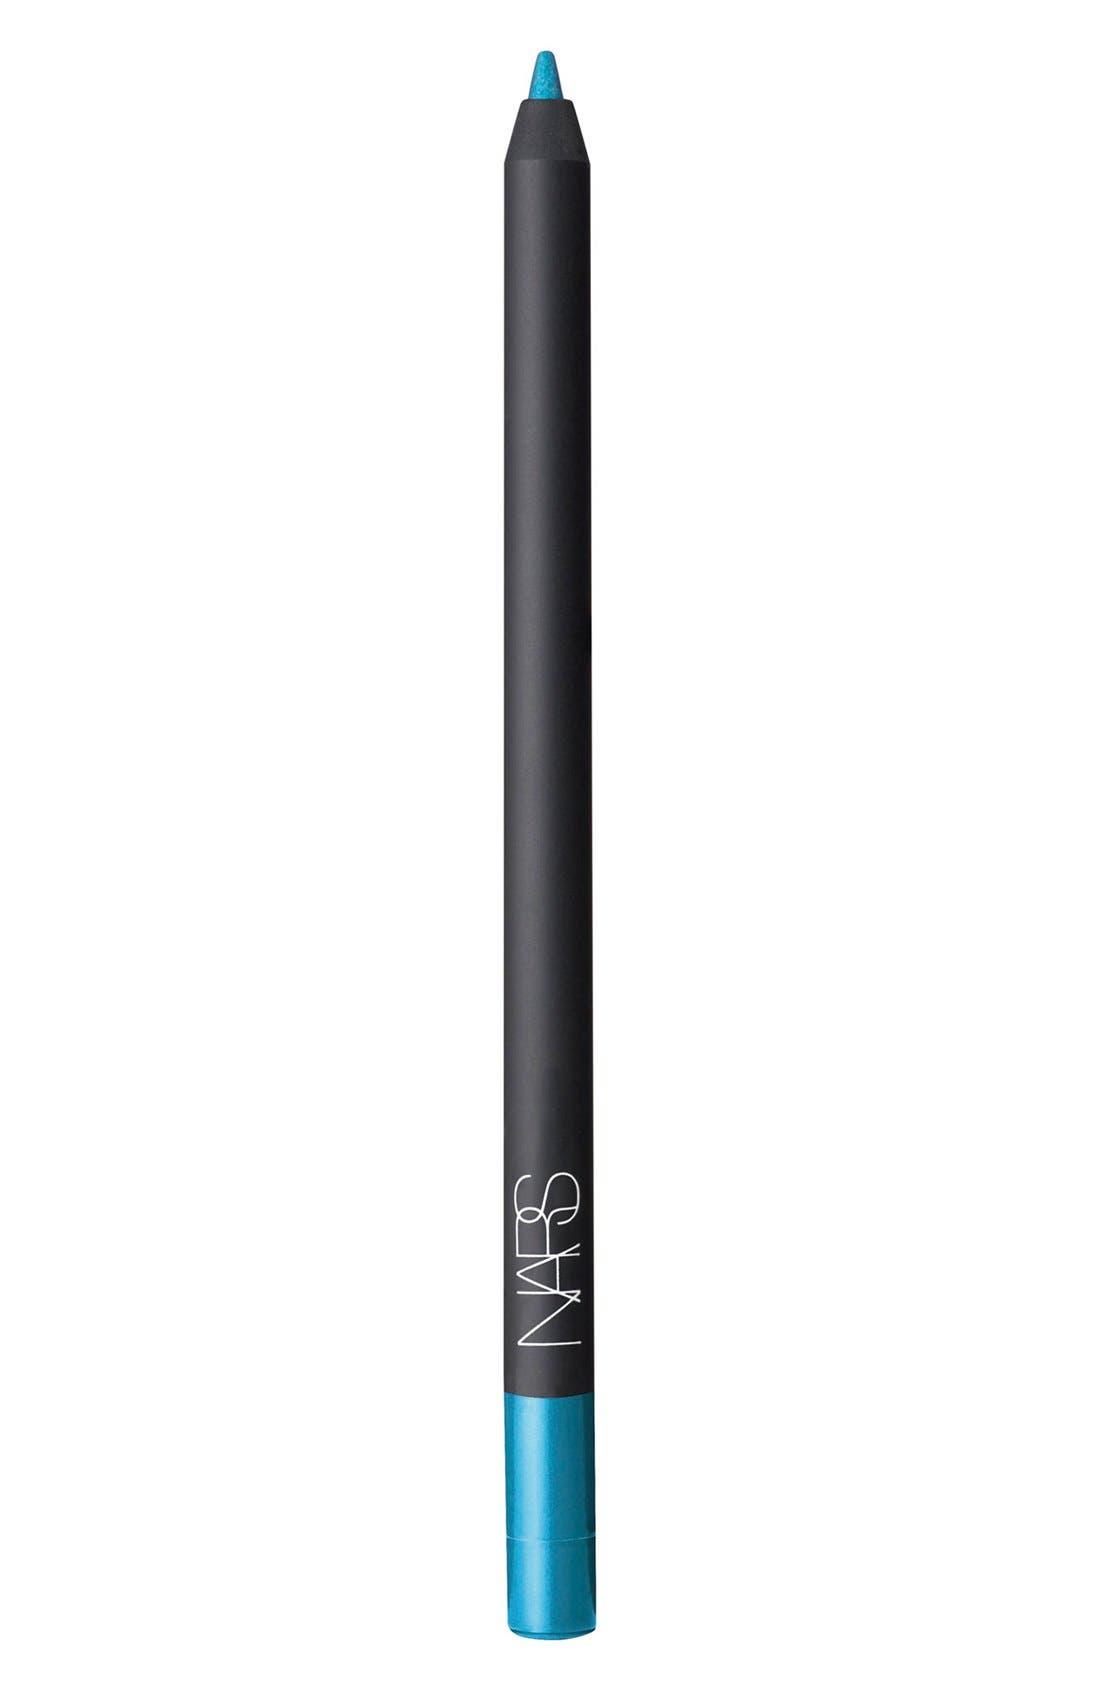 Nars Larger Than Life Long Wear Eyeliner - Khao San Road